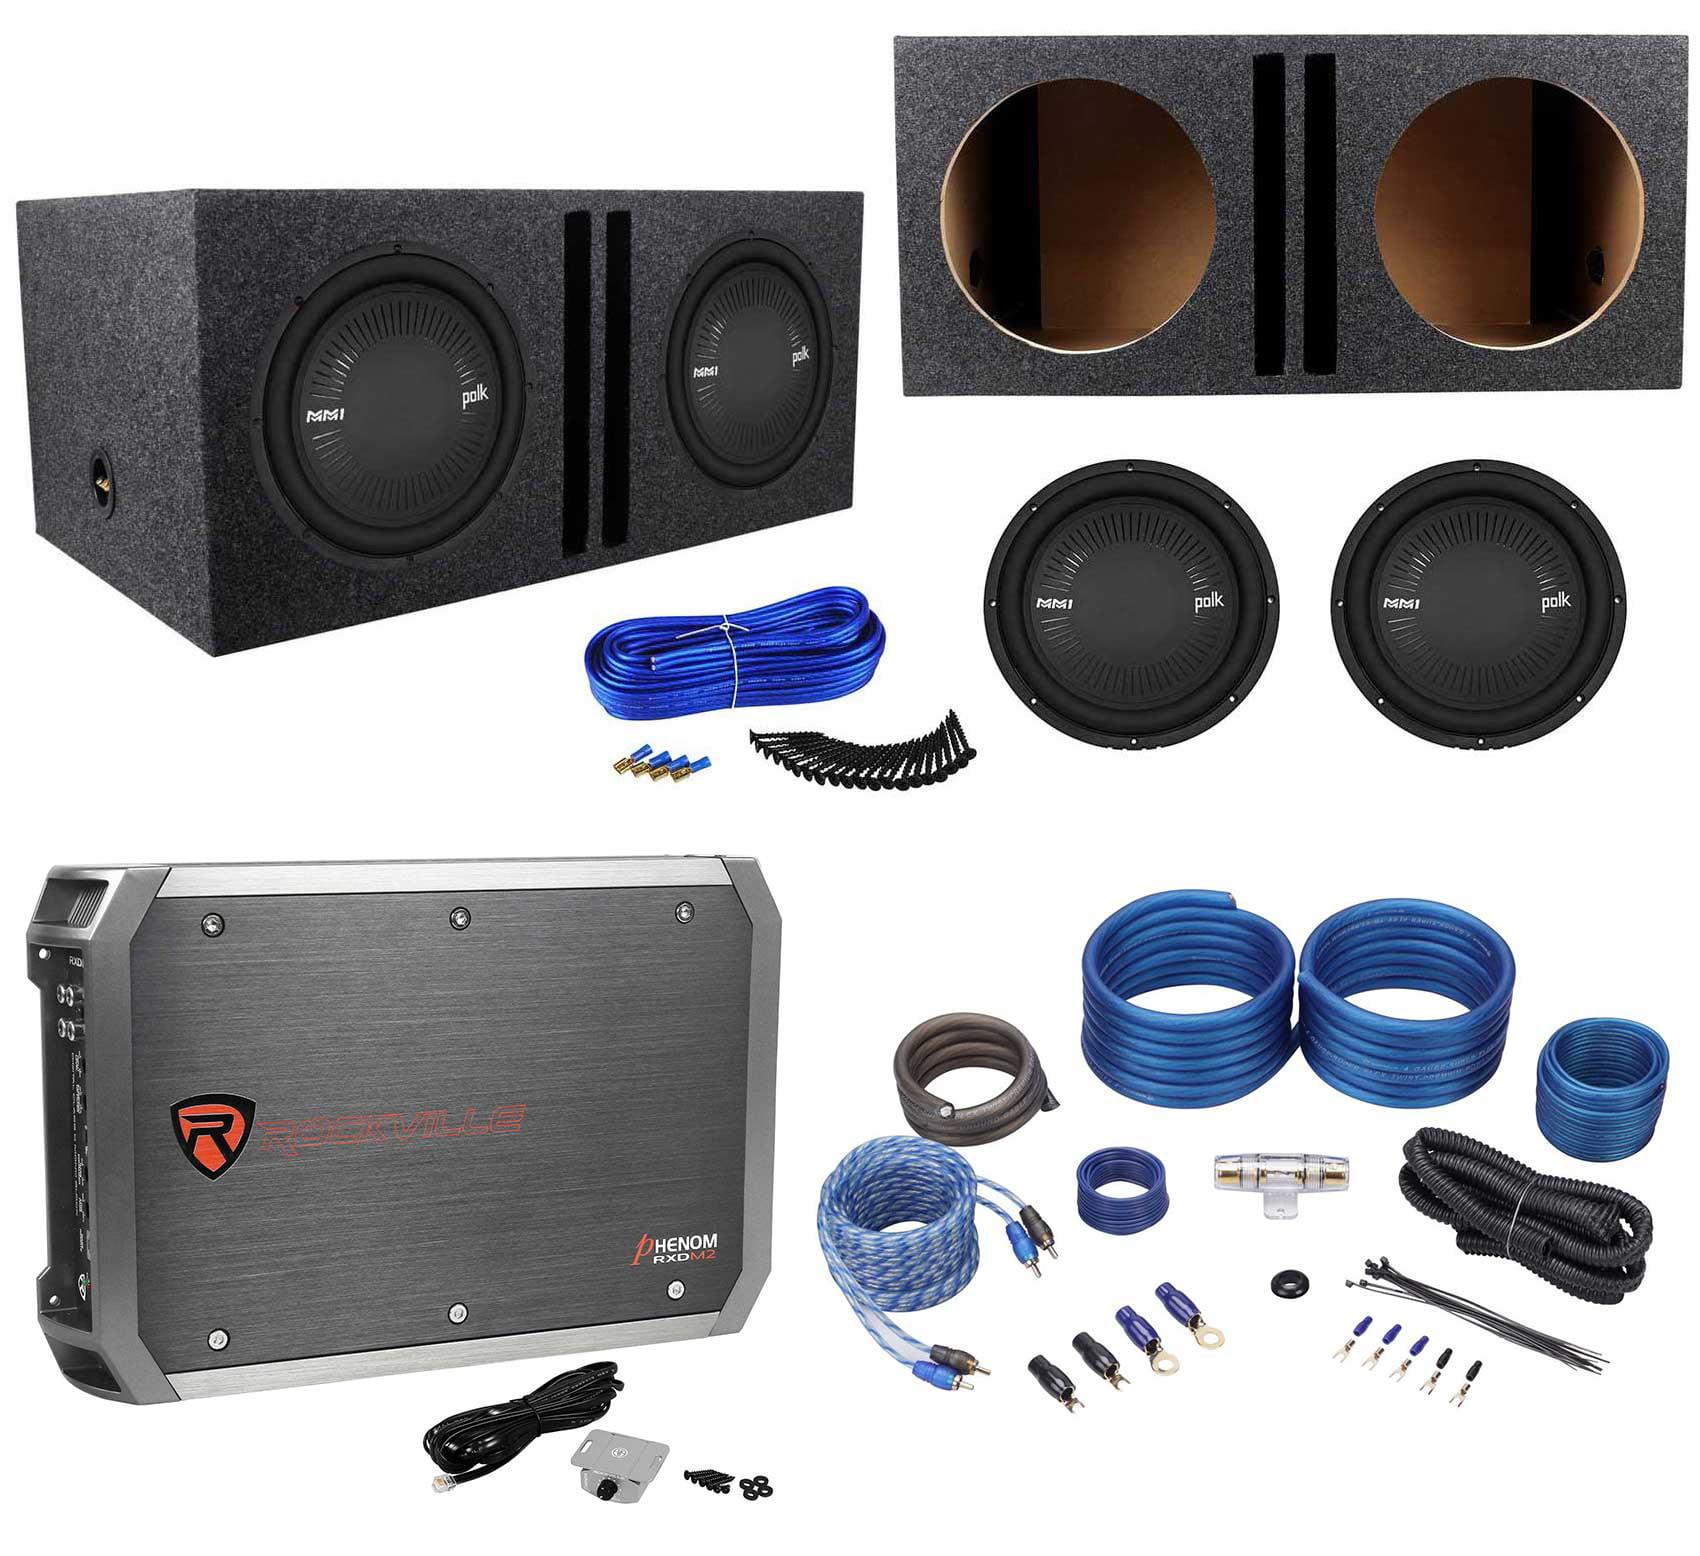 hight resolution of 2 polk audio mm 1242 dvc 12 2520w subwoofers vented box mono amplifier amp kit walmart com